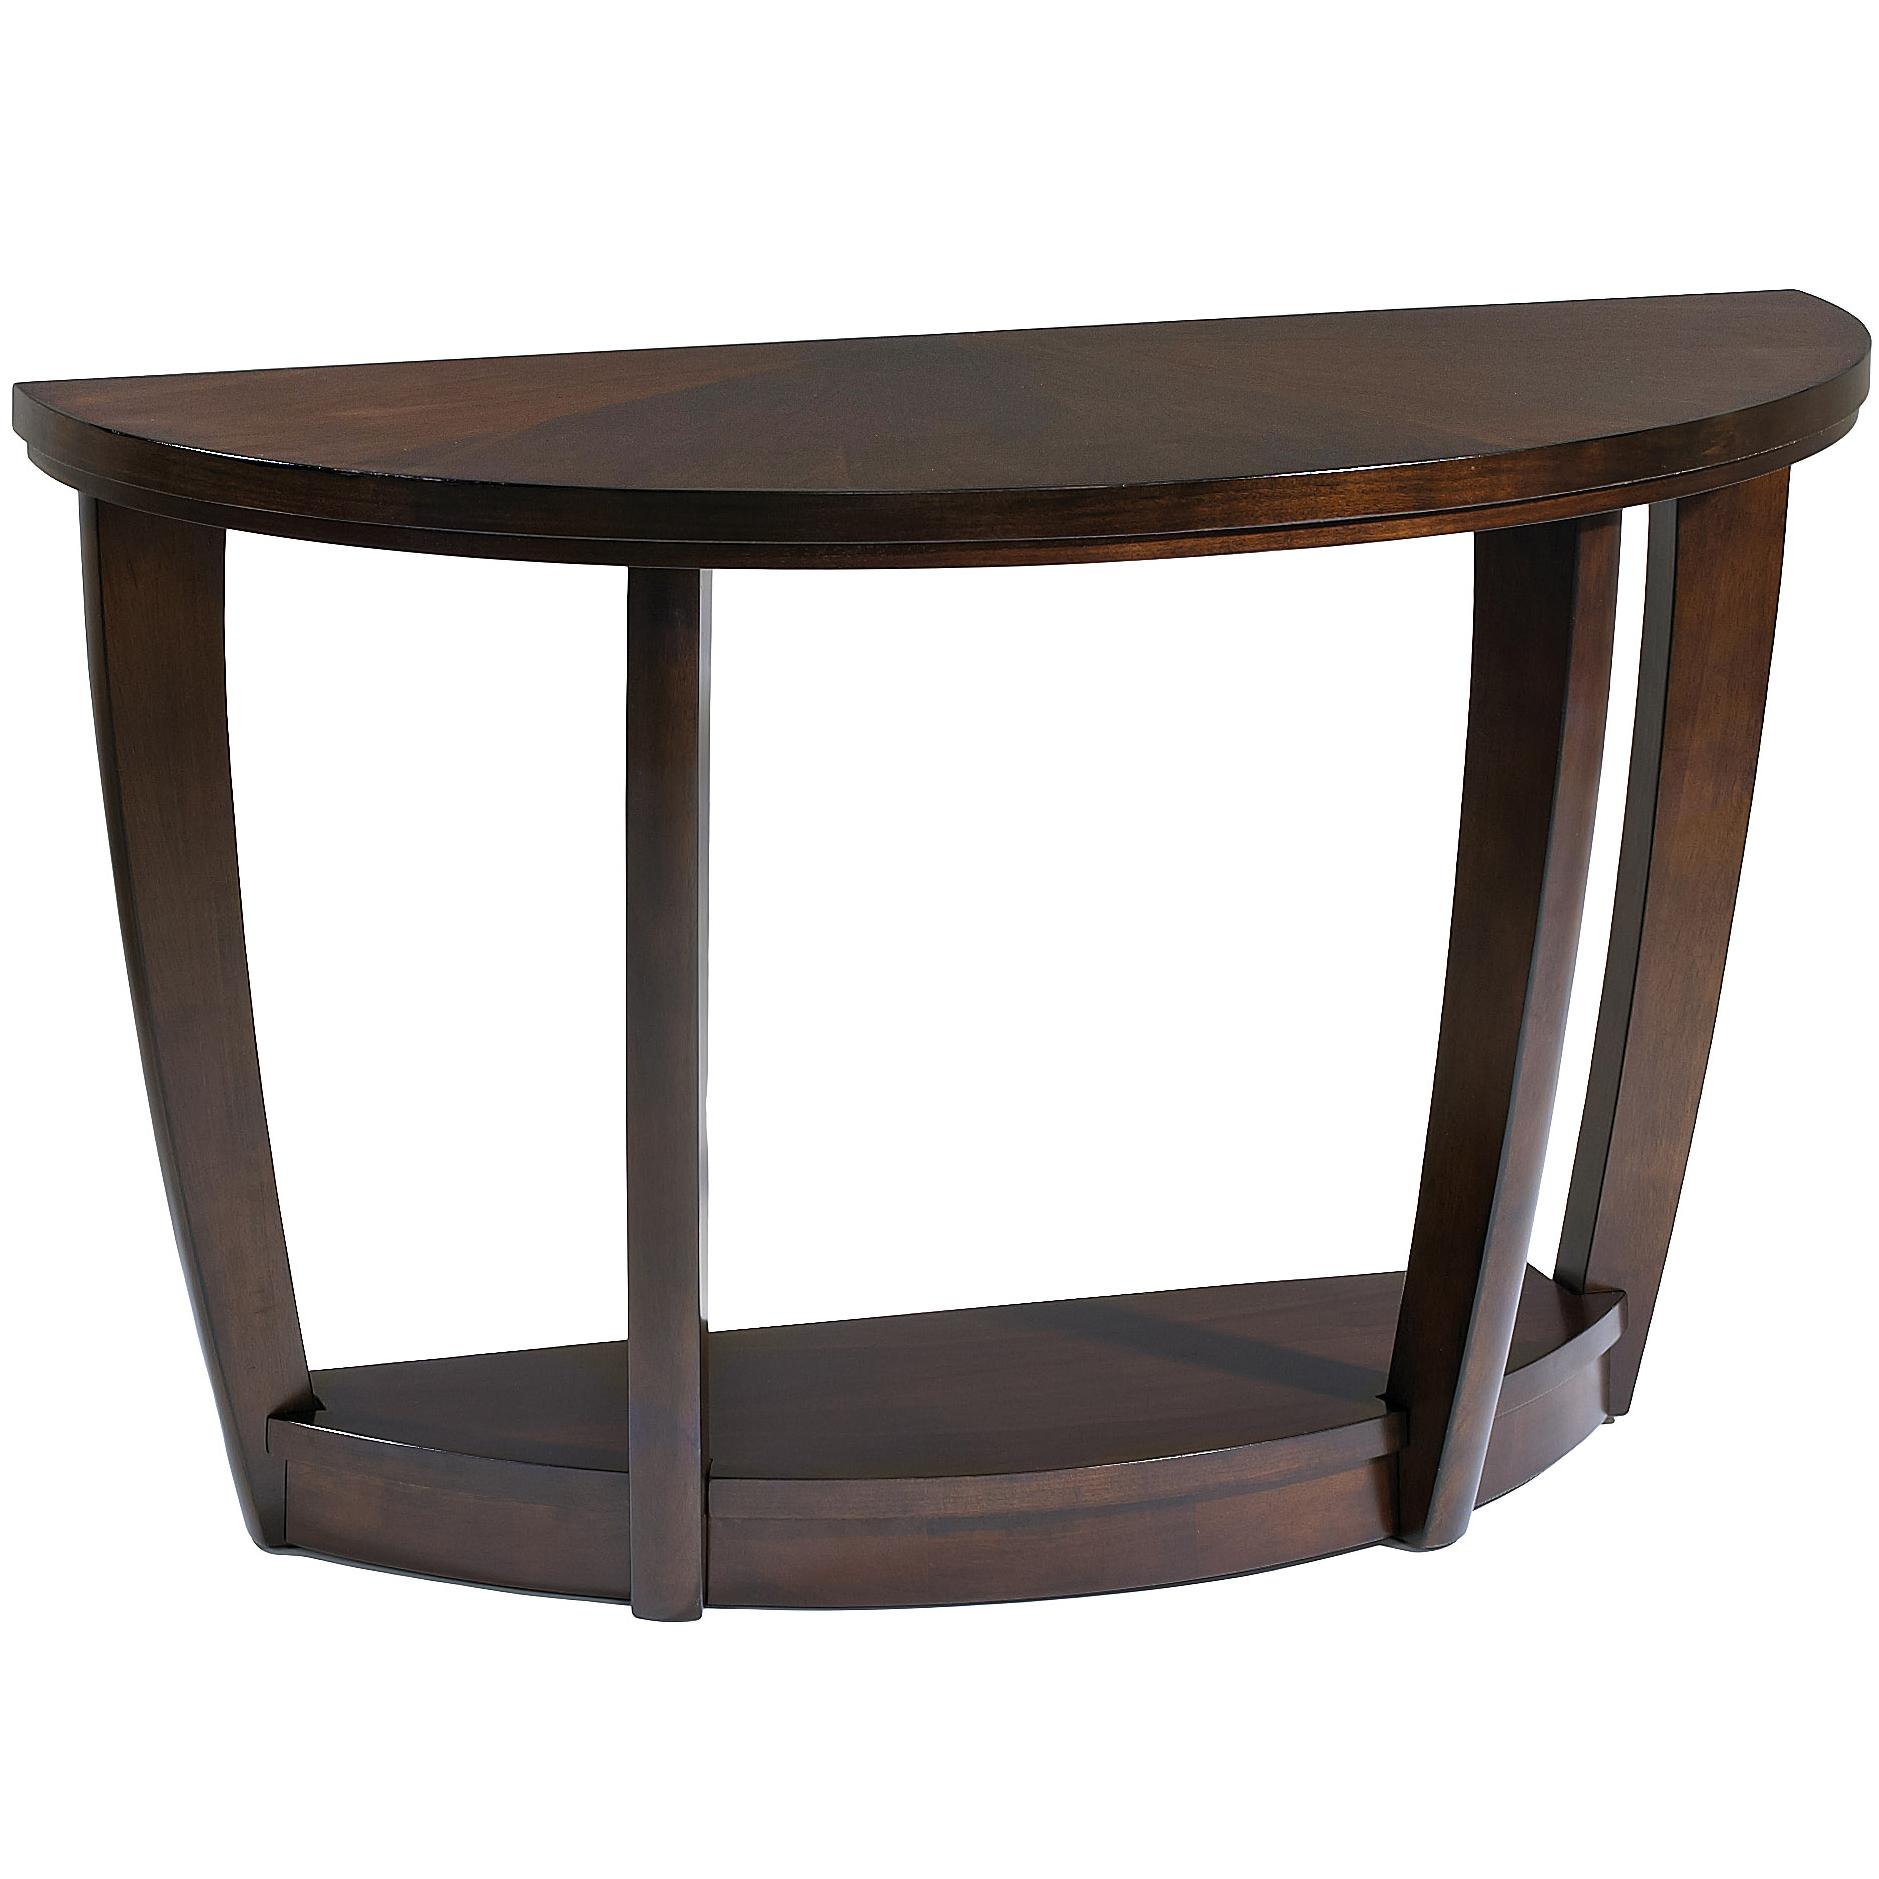 Klaussner International Hayden  Sofa Table - Item Number: 764-825 STBL